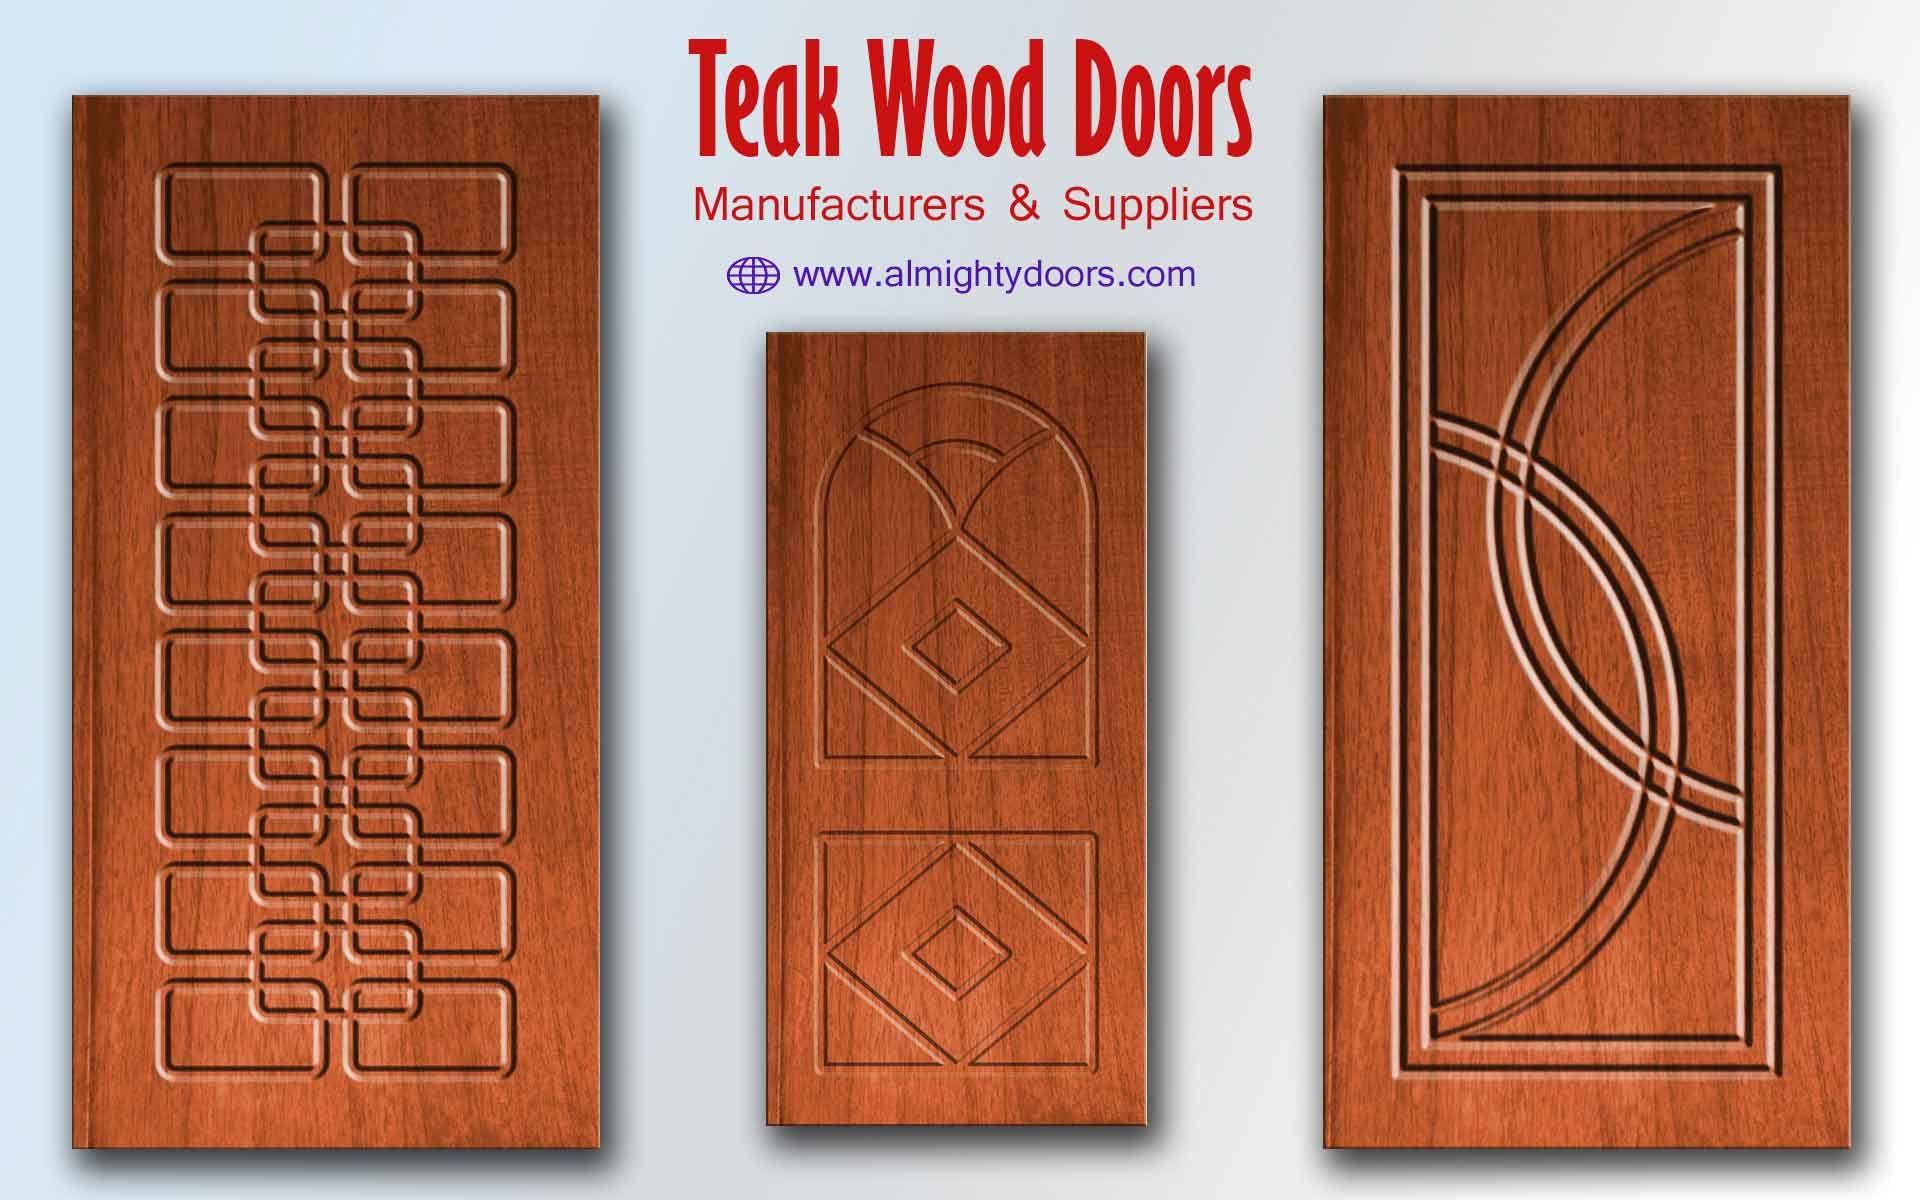 Teak Wood Furniture Manufacturers And Suppliers In Tamilnadu Burma Teak Wood Doors And Teak Wood Furniture Wooden Main Door Door Manufacturer Solid Wood Doors